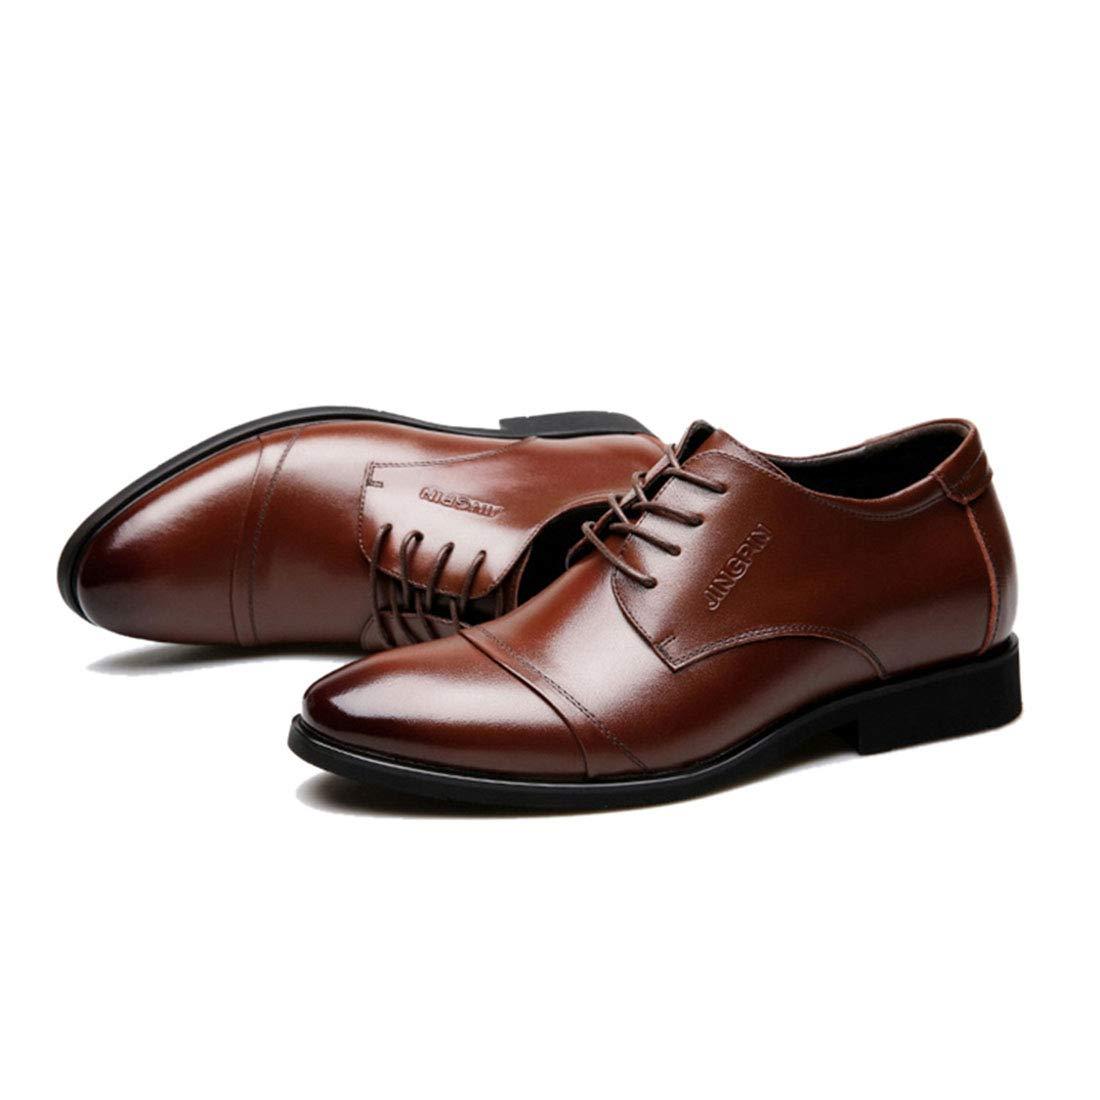 Jiyaru Mens Casual Oxford Lace Up Business Dress Wedding Shoes Brown Asian 41 / US 8 by Jiyaru (Image #3)